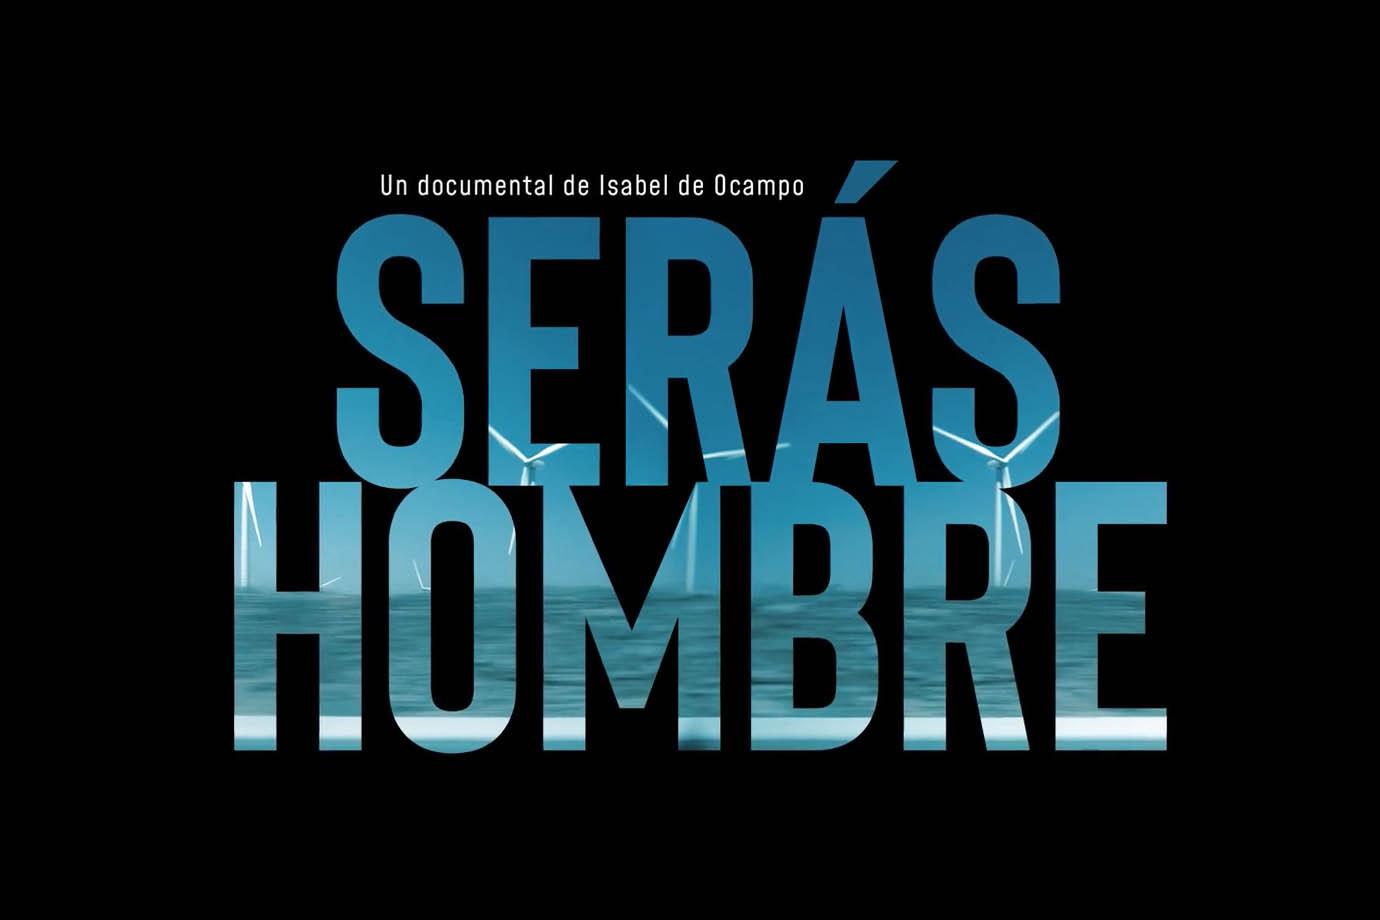 Serás Hombre - Documentary